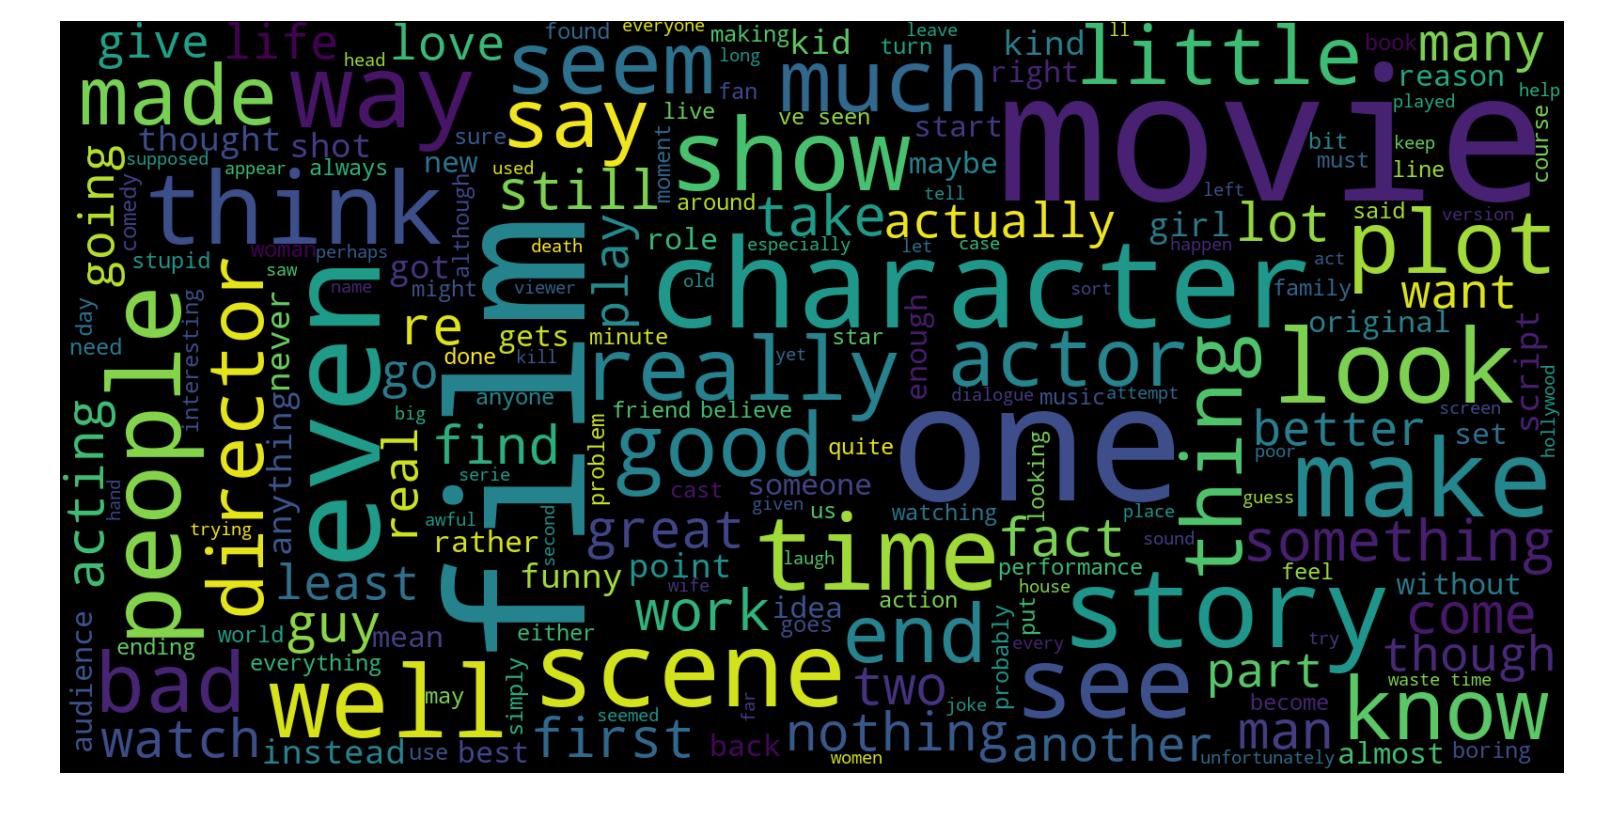 DataScienceToday - Sentiment Analysis using Python (Part I - Machine